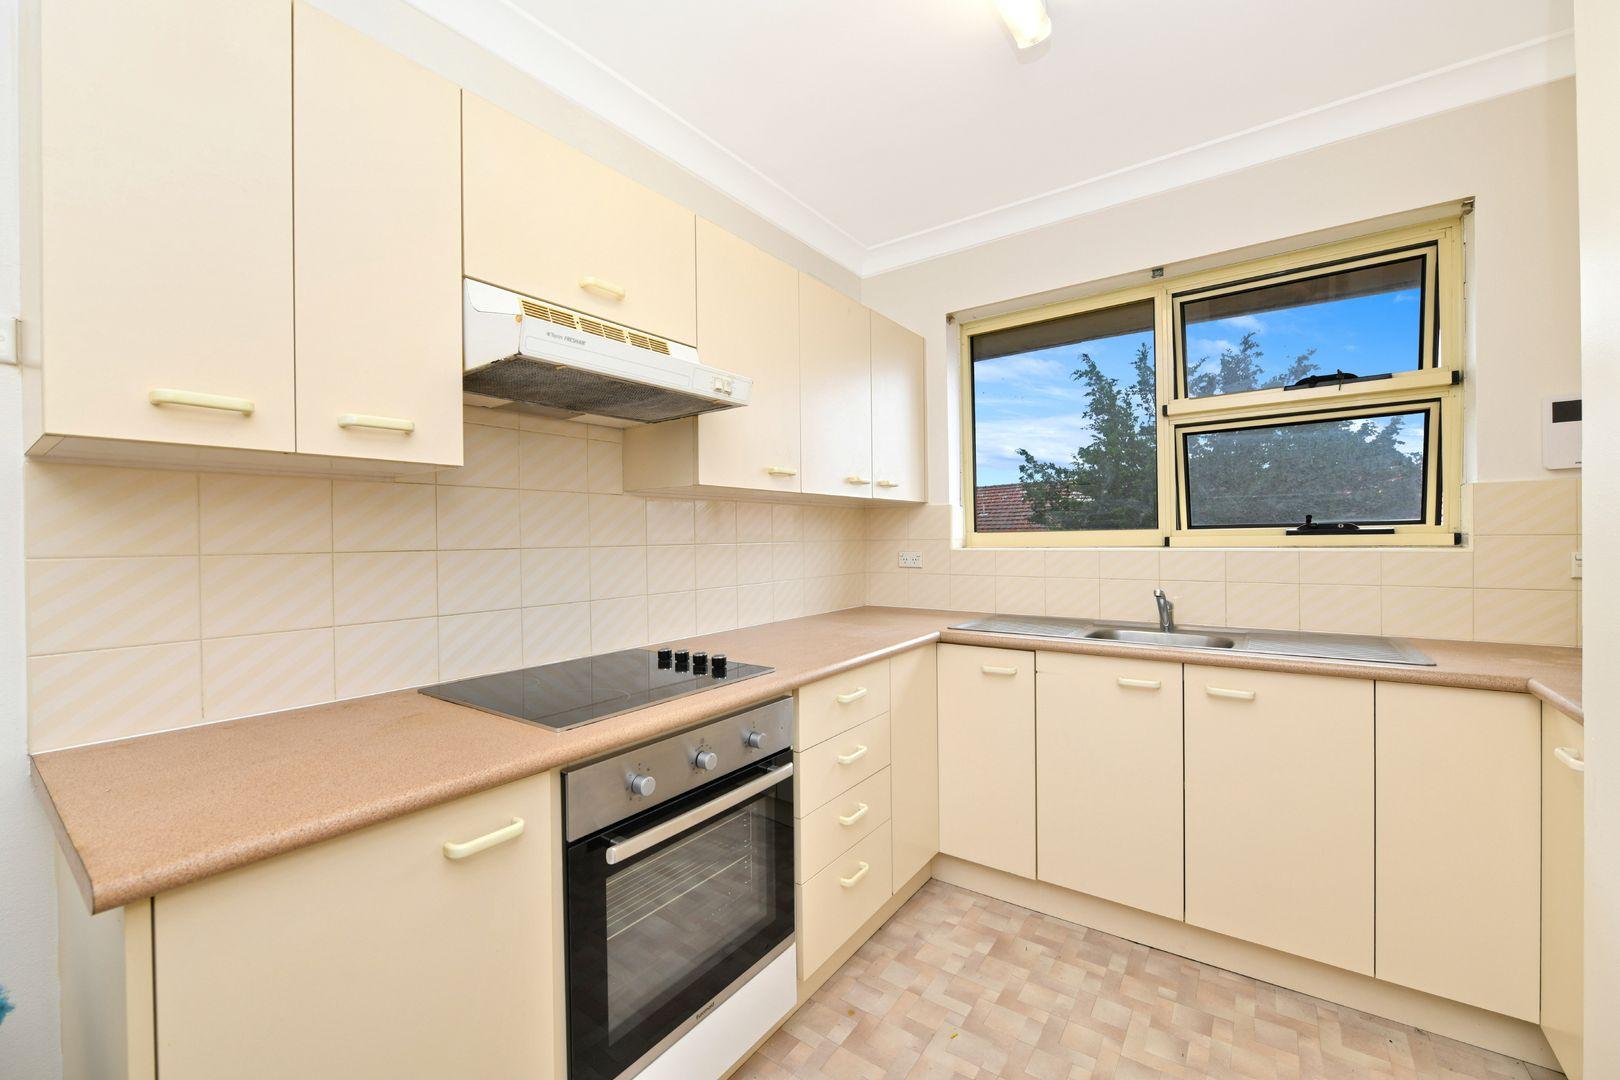 6/18 Cleland Road, Artarmon NSW 2064, Image 1